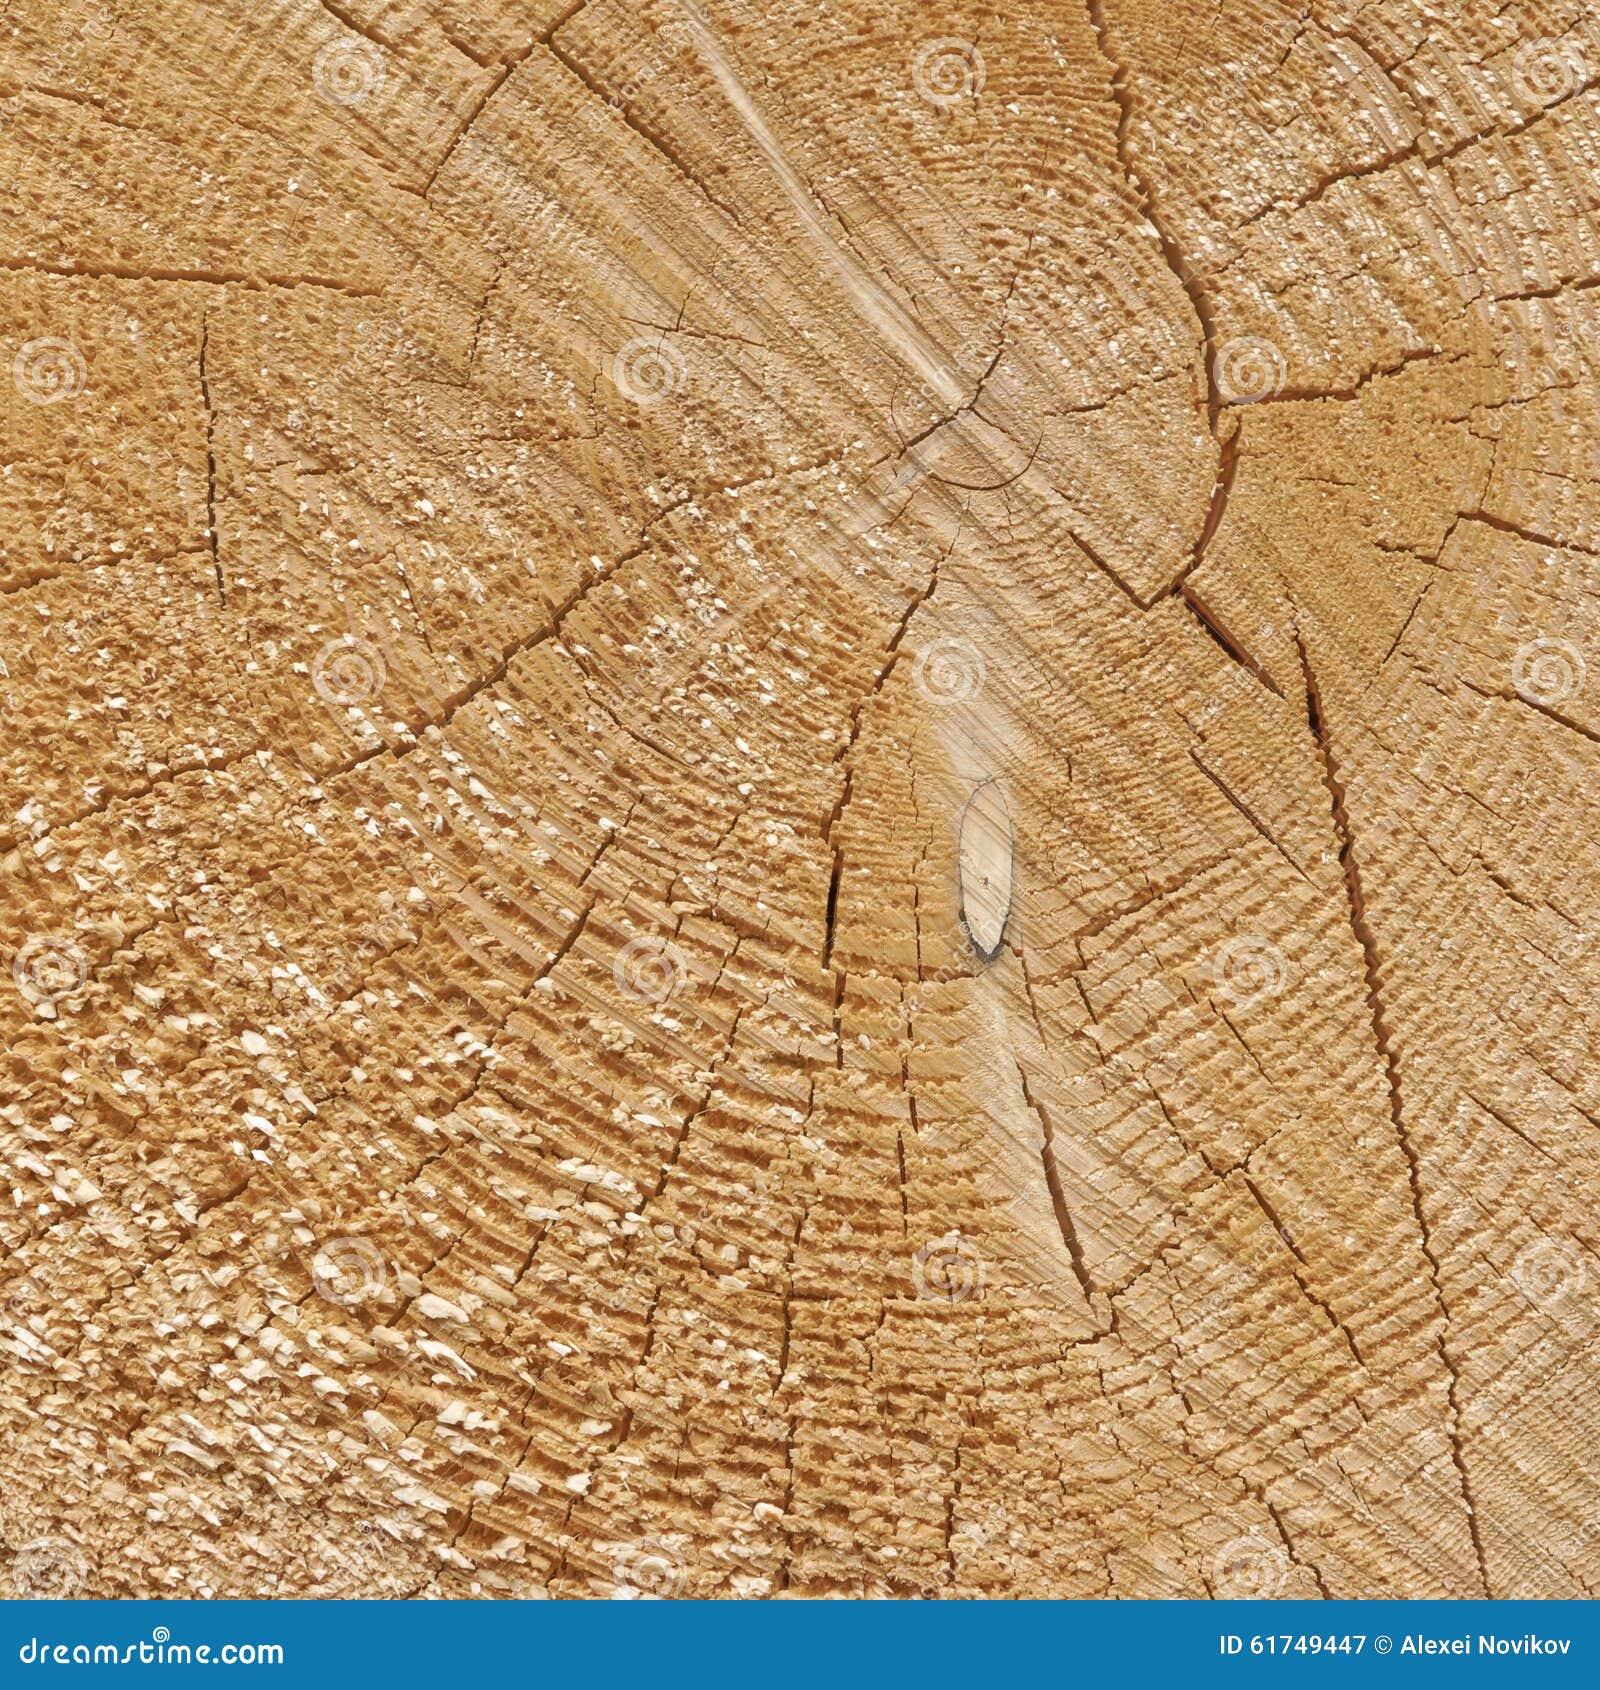 Natural Old Wood Grain Log Square Frame Texture Close-Up Stock Image ...